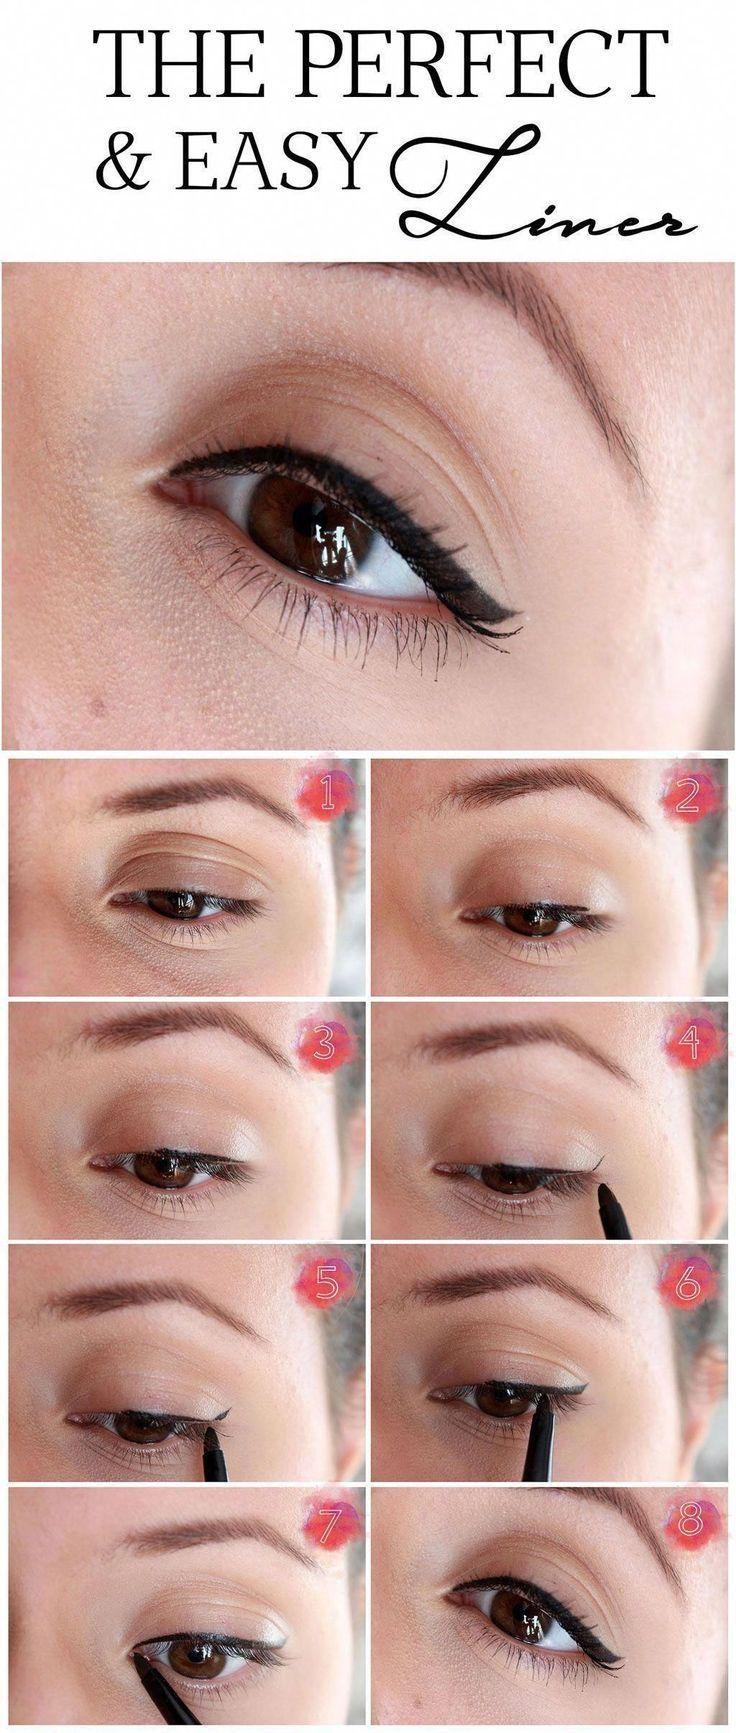 geflugelte eyeliner schritt fur schritt